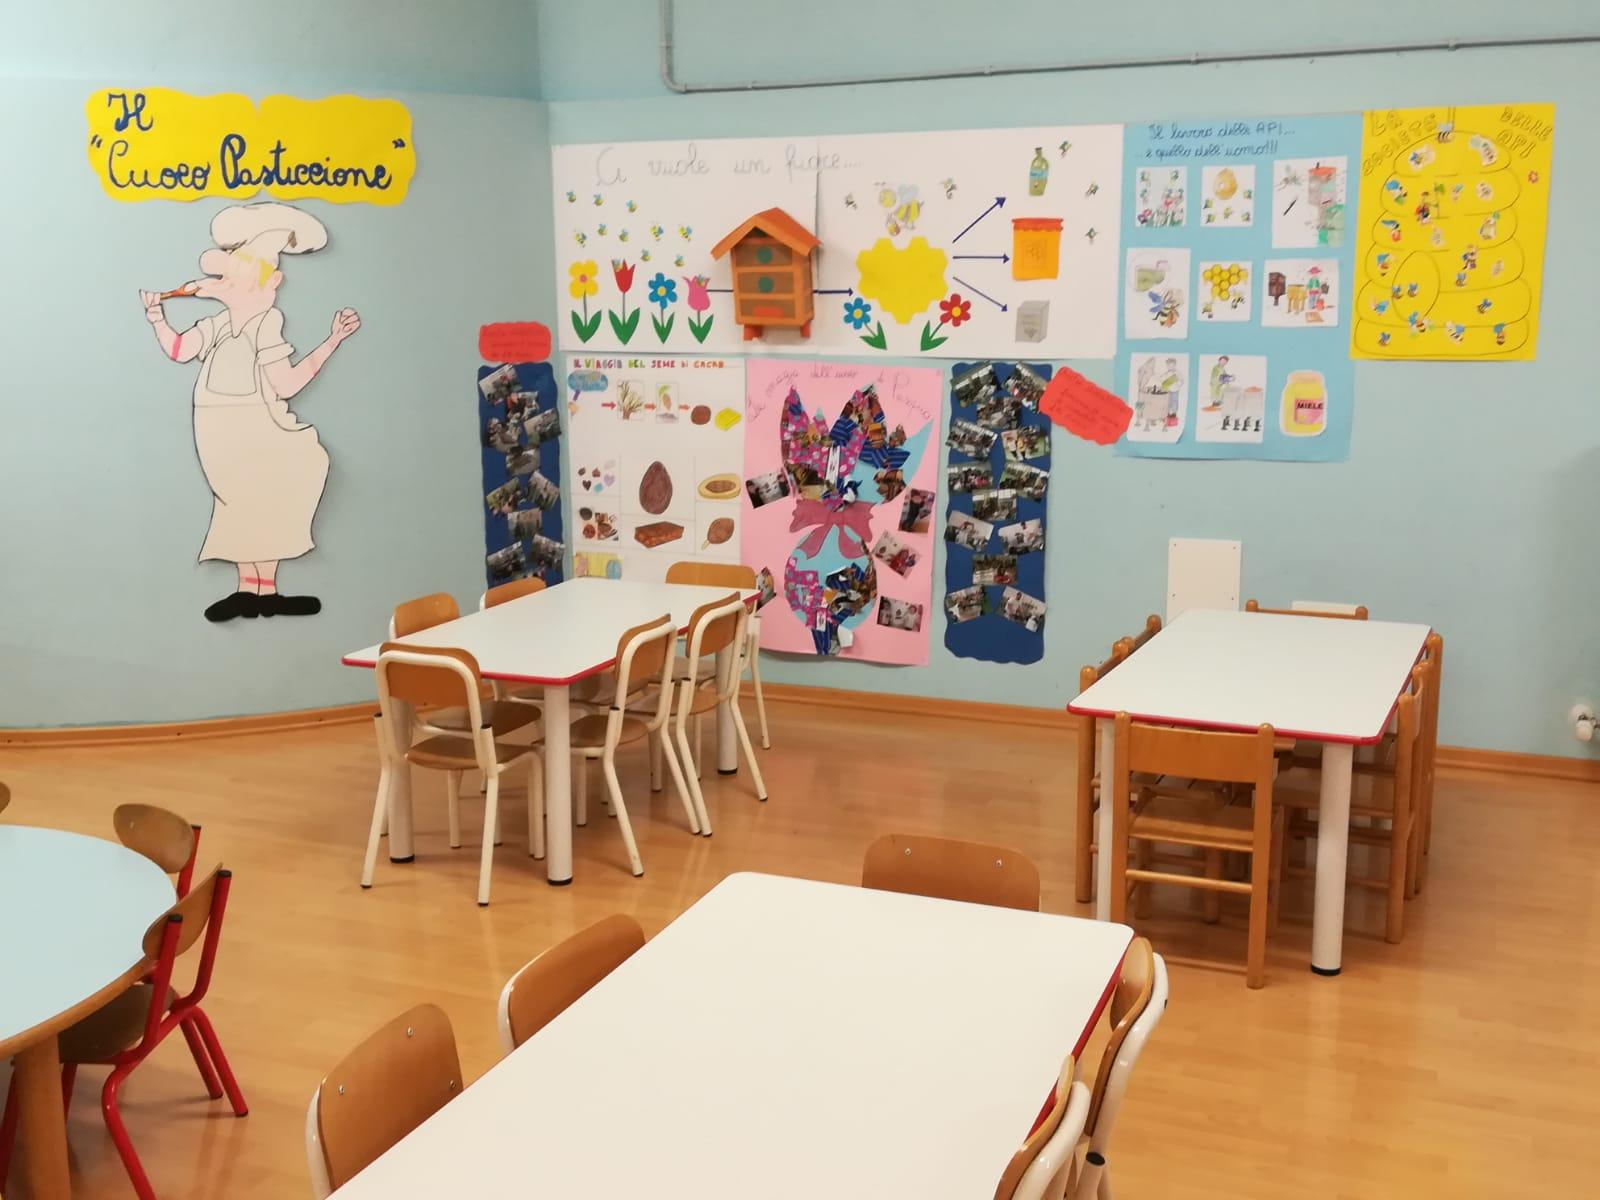 Foto casetta Fantasia, foto raffigurante l'area apprendimento dei bimbi